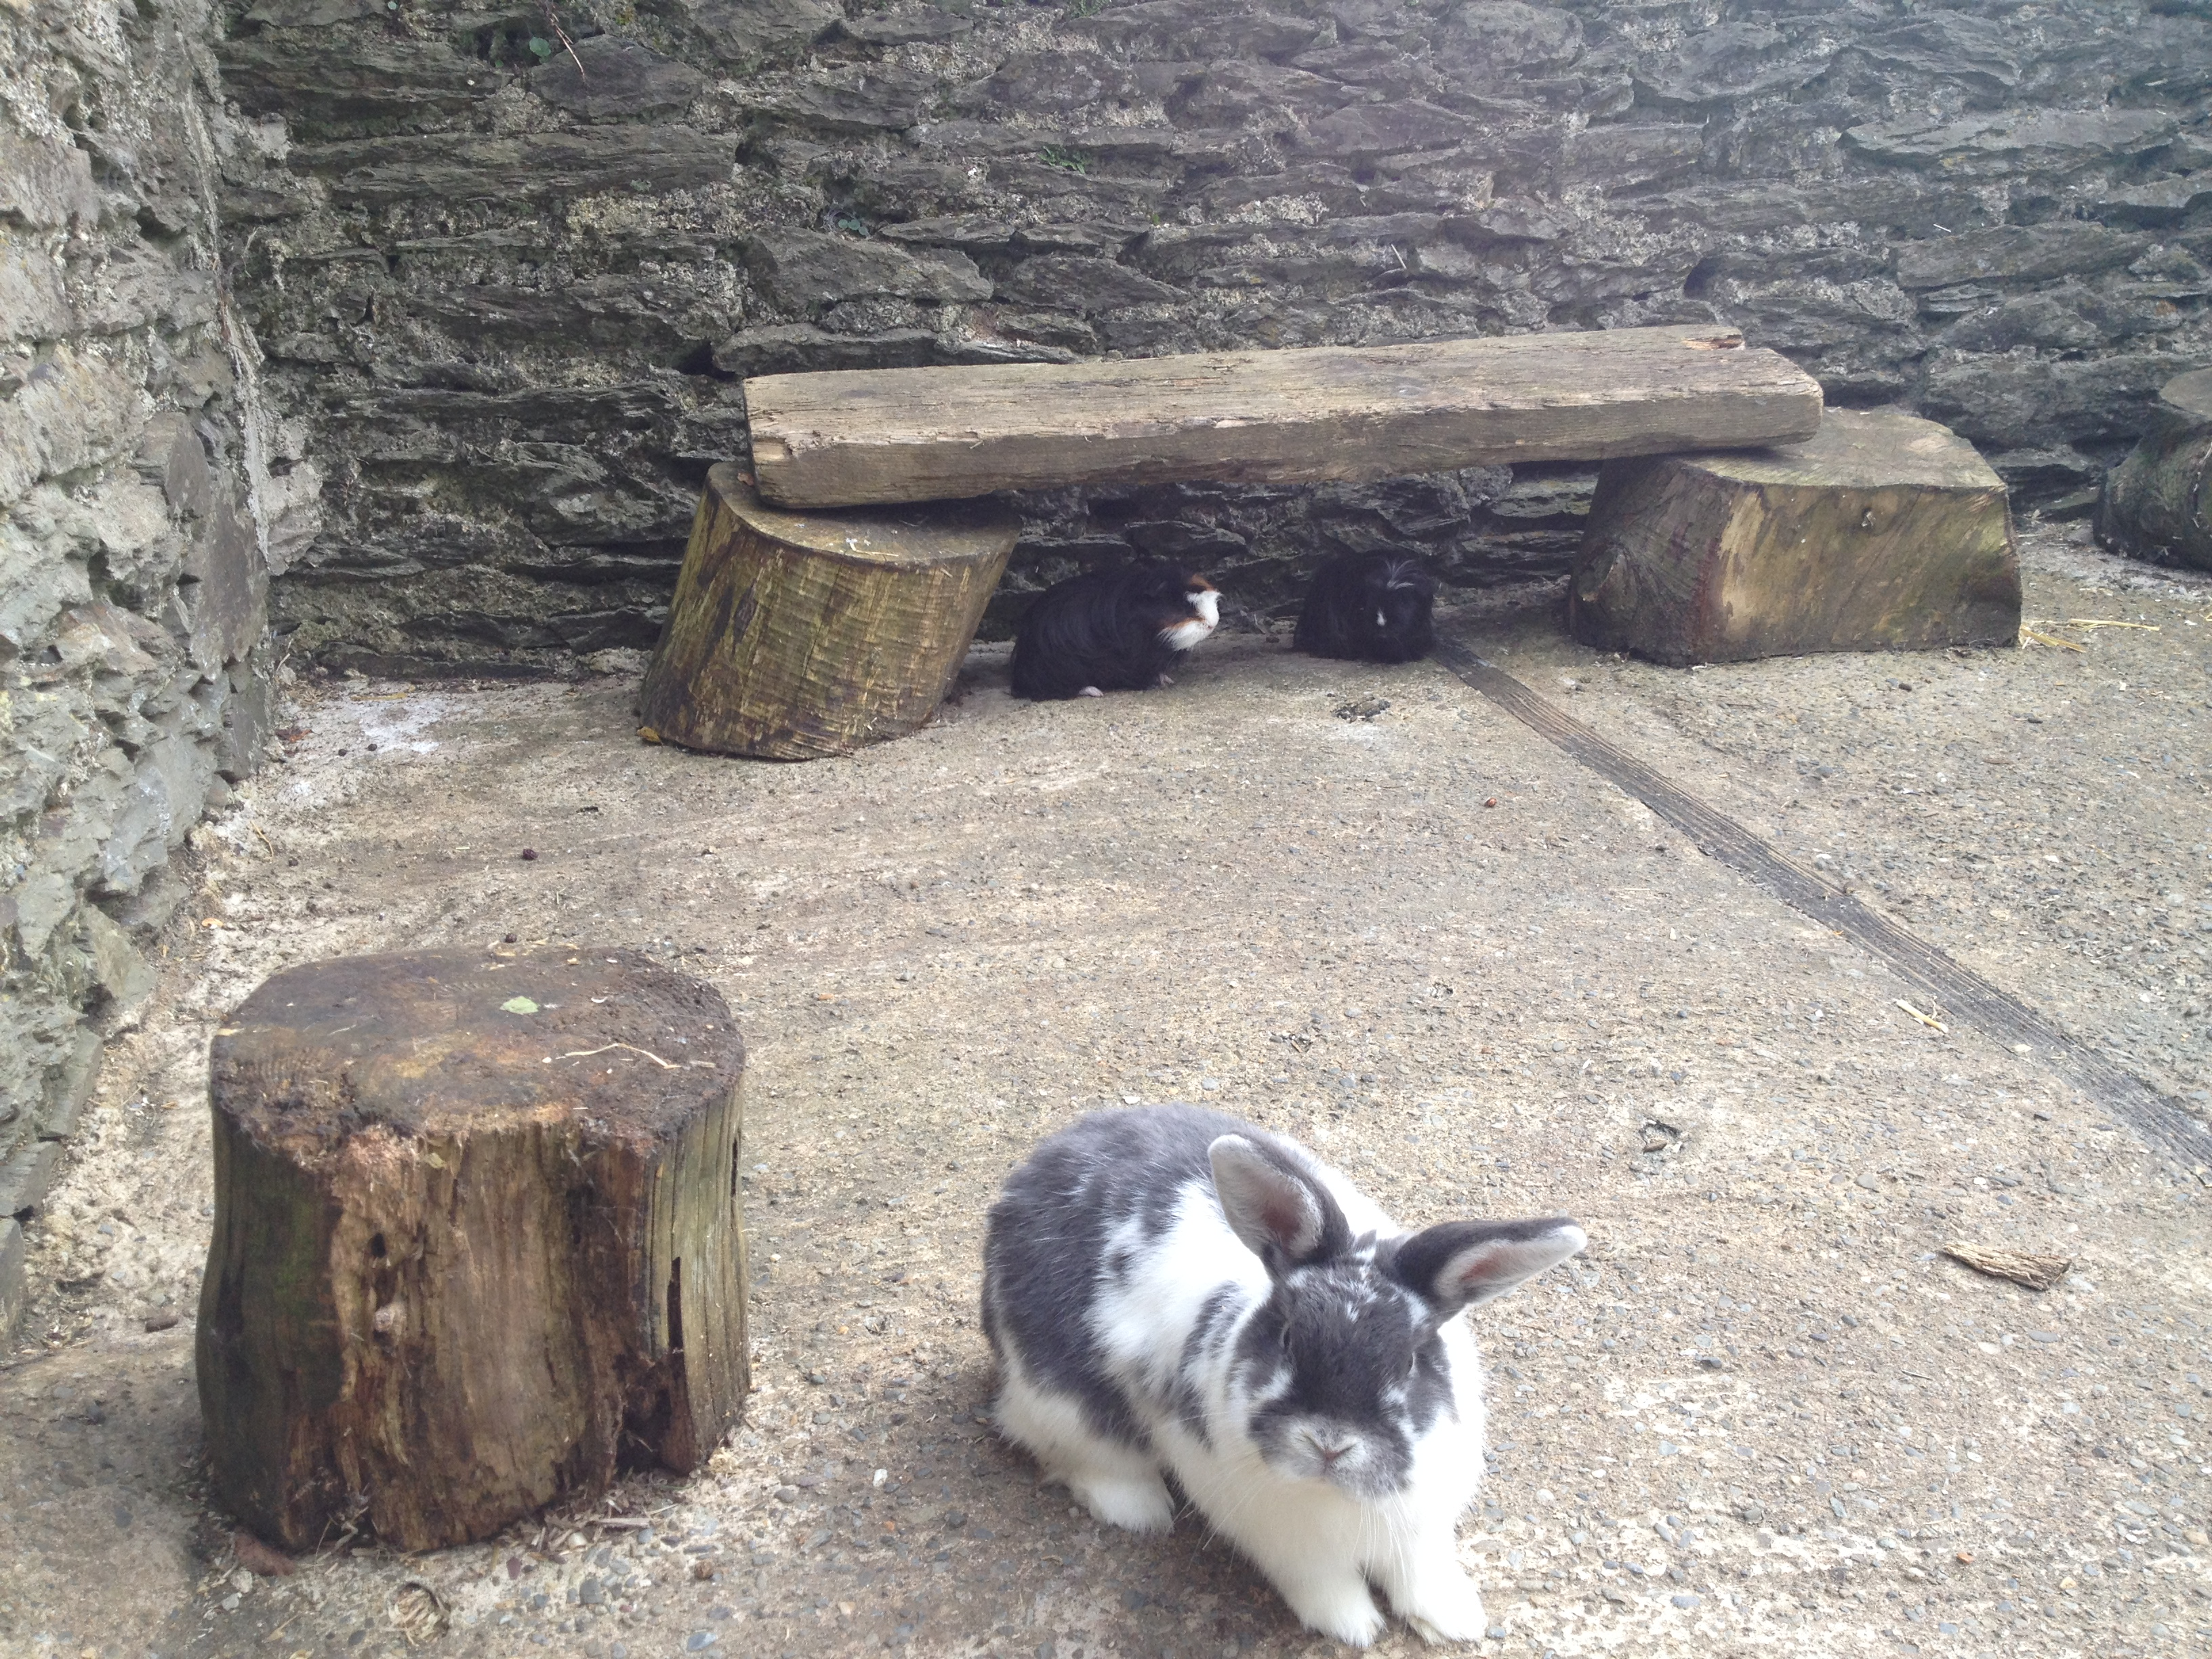 Friendly Rabbits